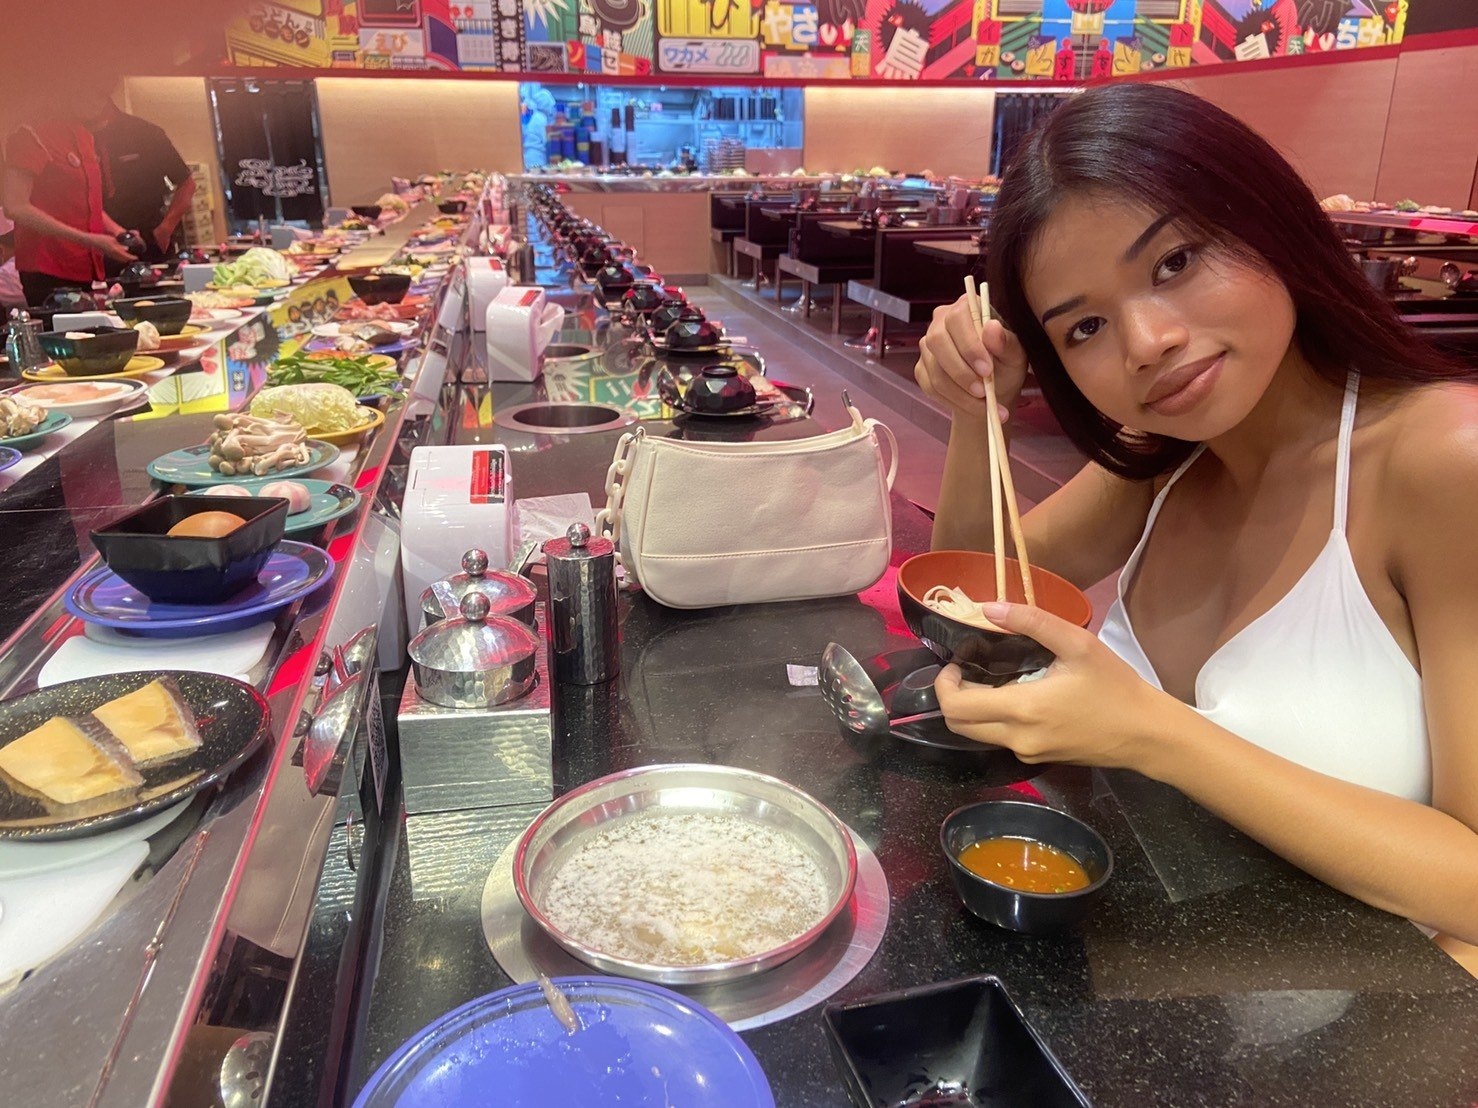 Mo Thai Pattaya Girl Leaked Onlyfans Best Xxx 0045